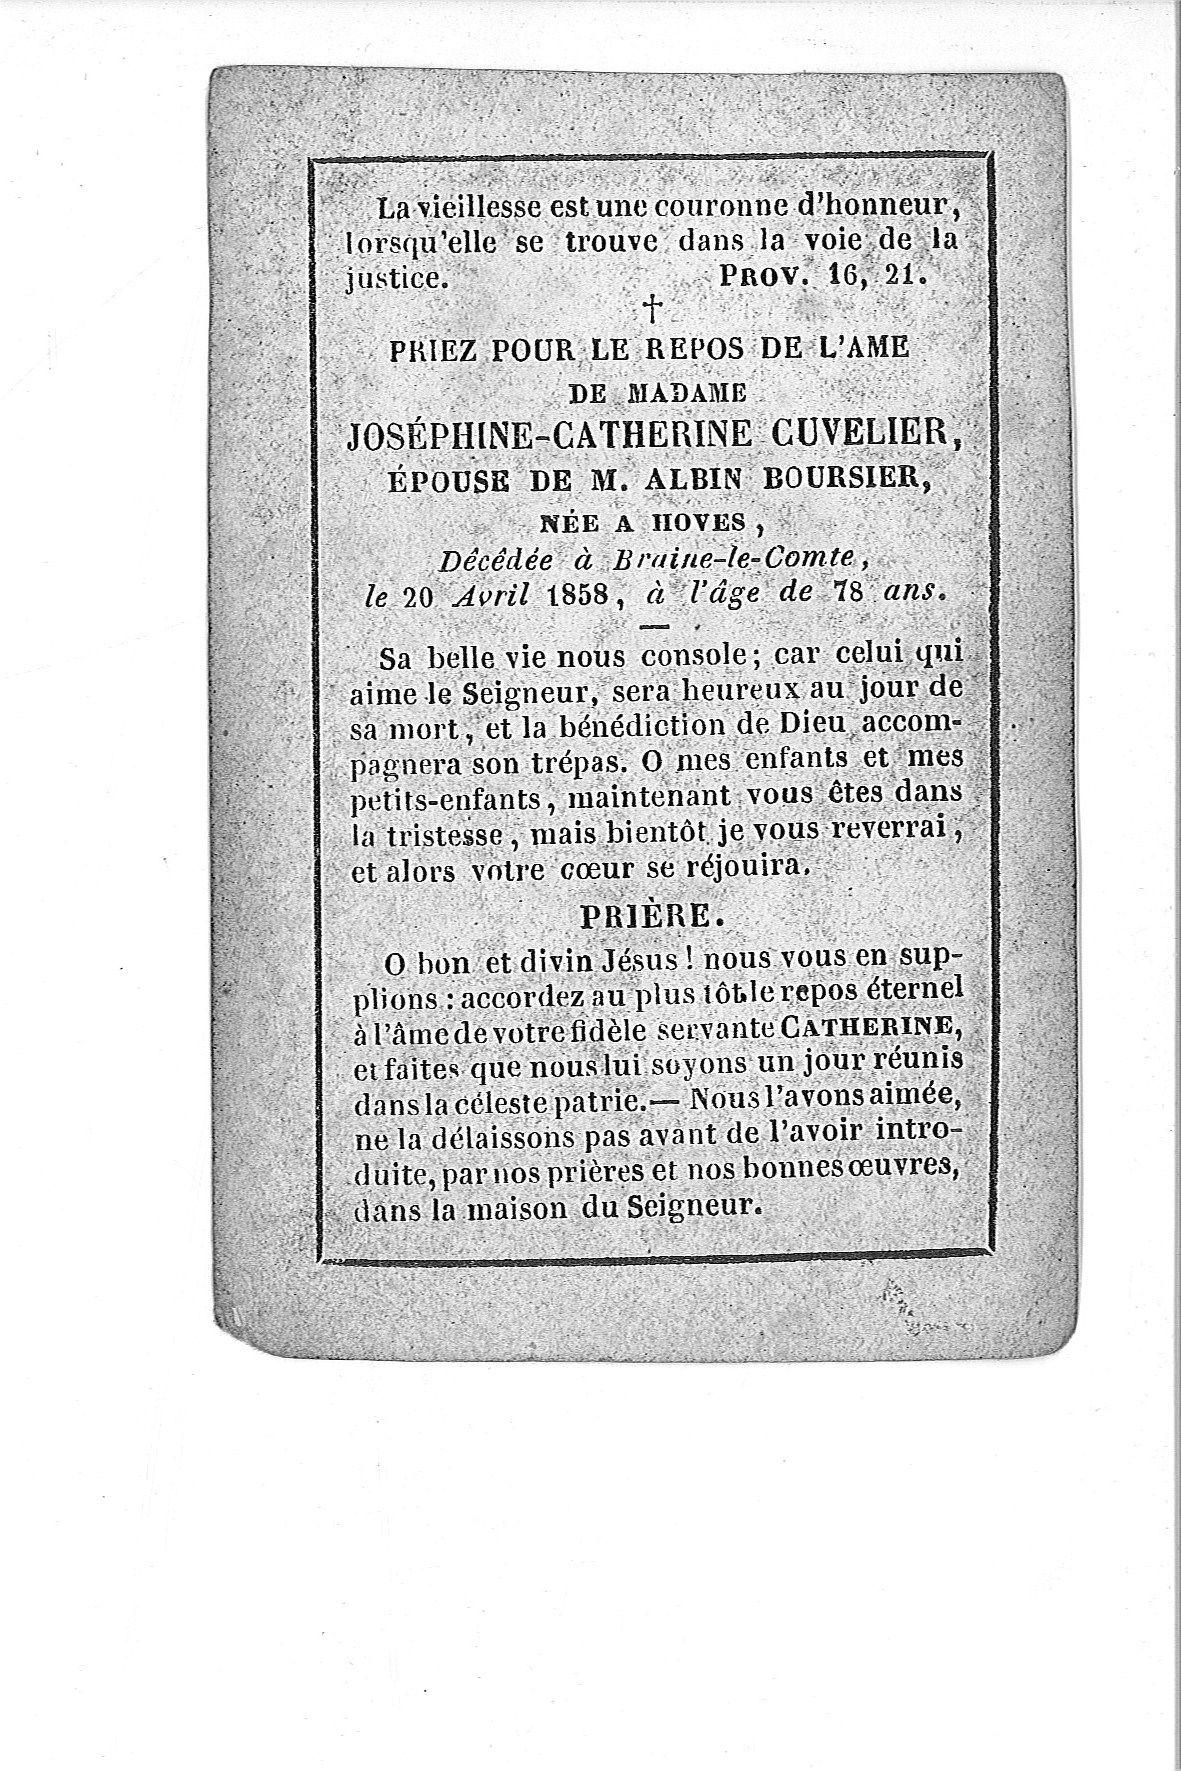 josephine-catherine(1858)20090323101150_00022.jpg